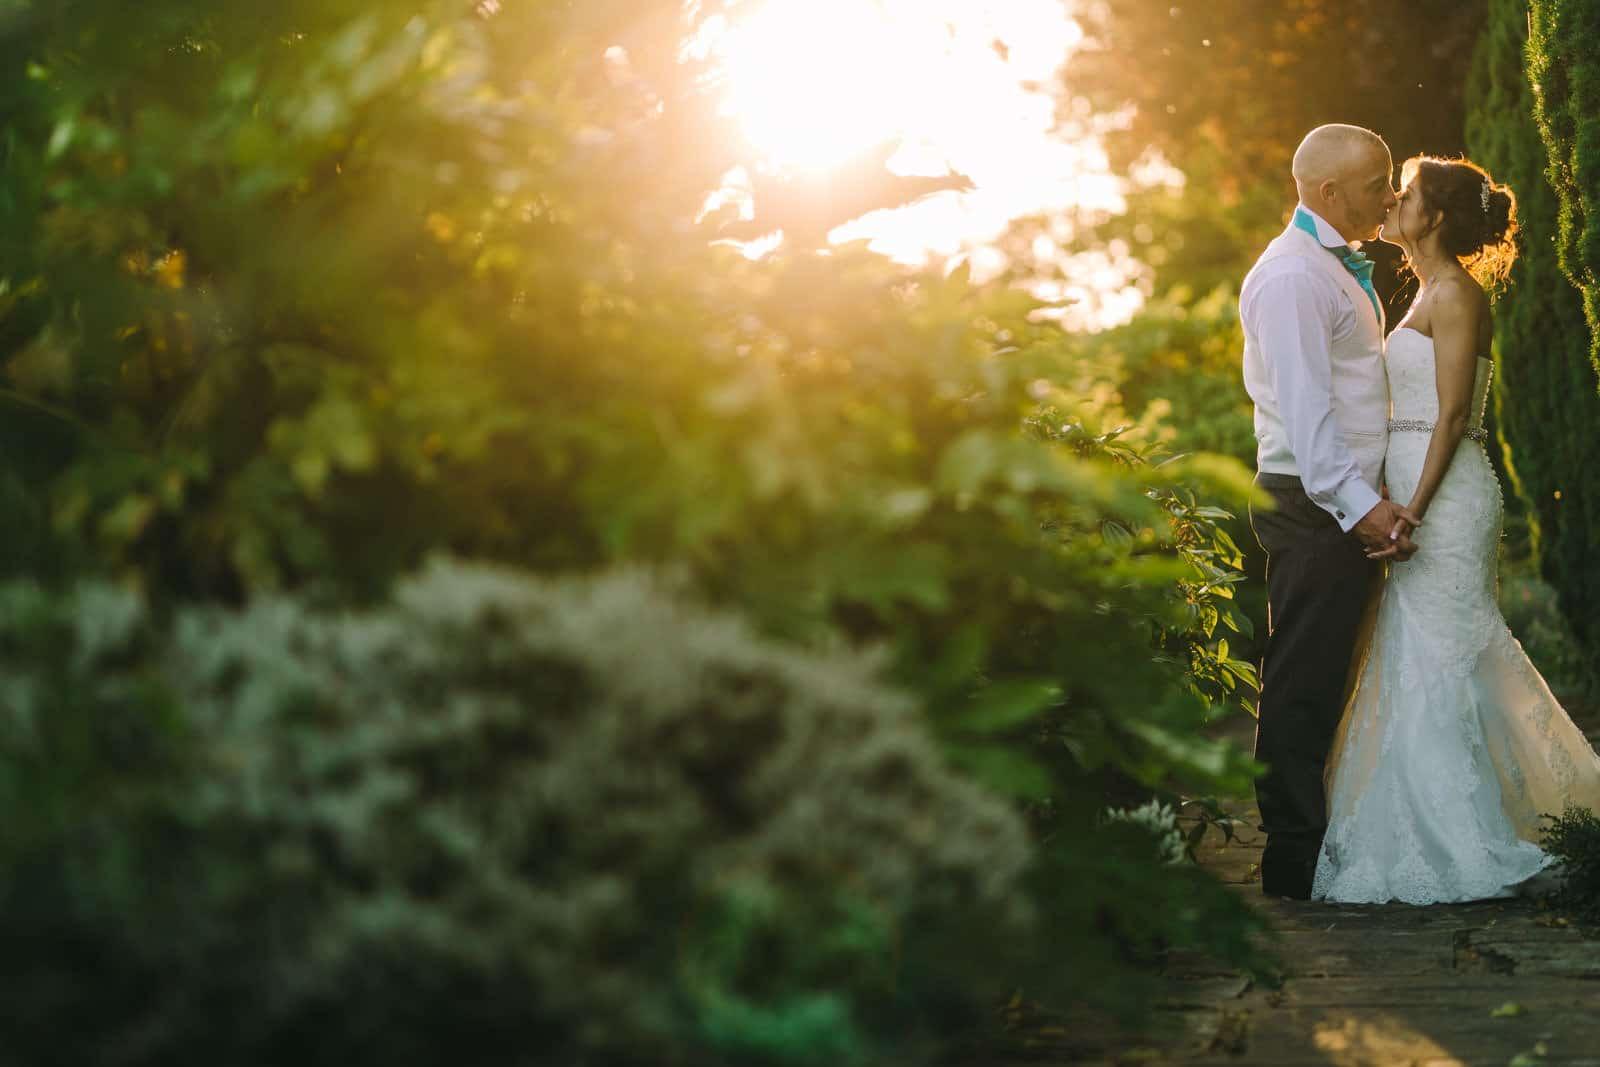 golden hour wedding photography at horwood house wedding venue in milton keynes